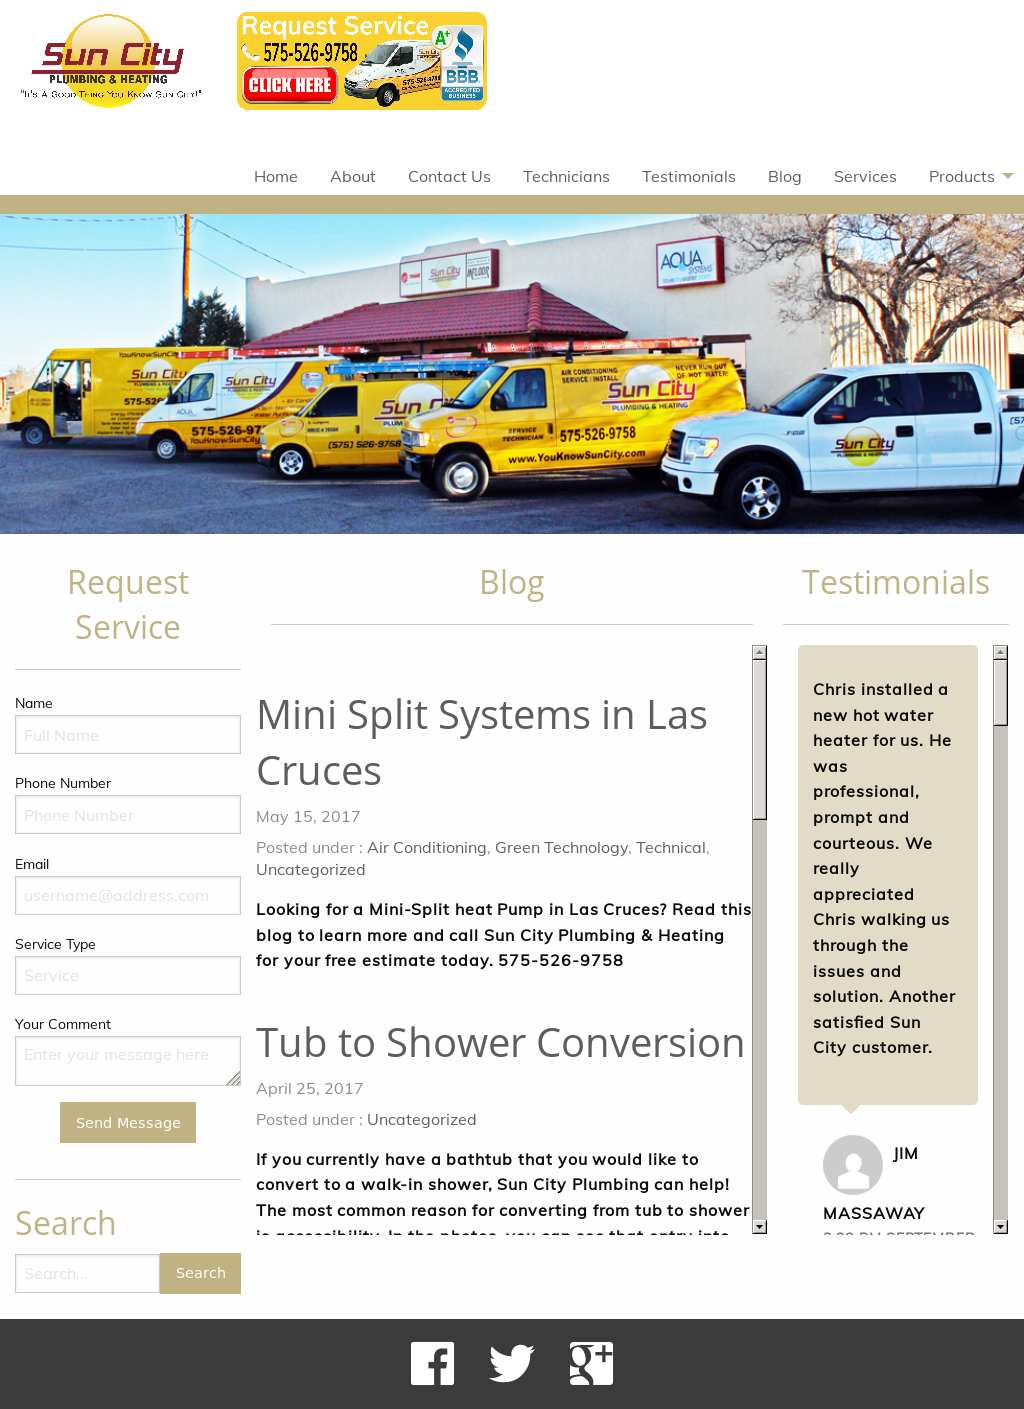 Sun City Plumbing Heating Website History